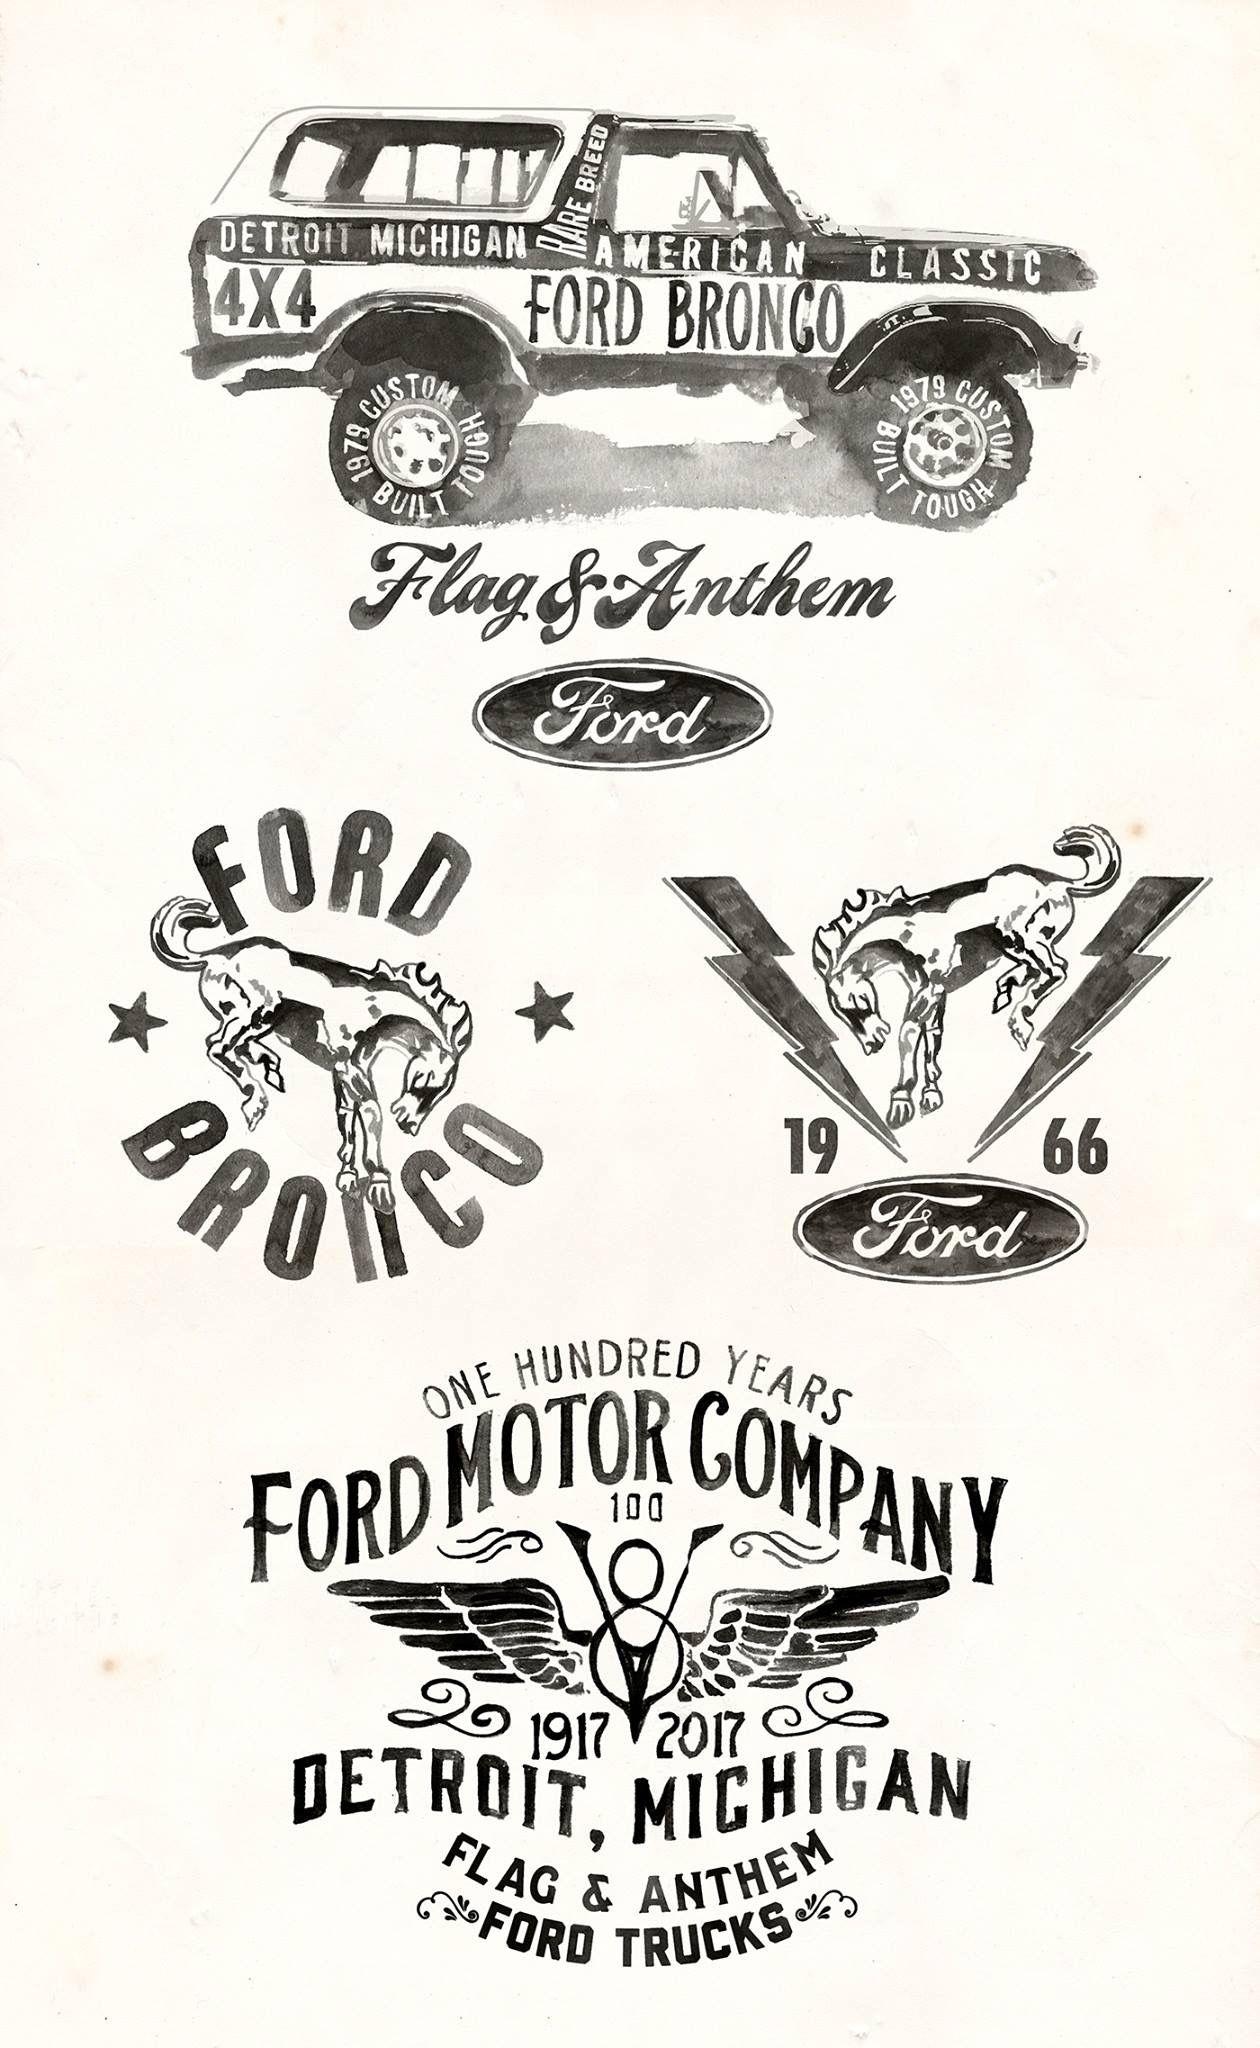 Pin on Ford Bronco addiction